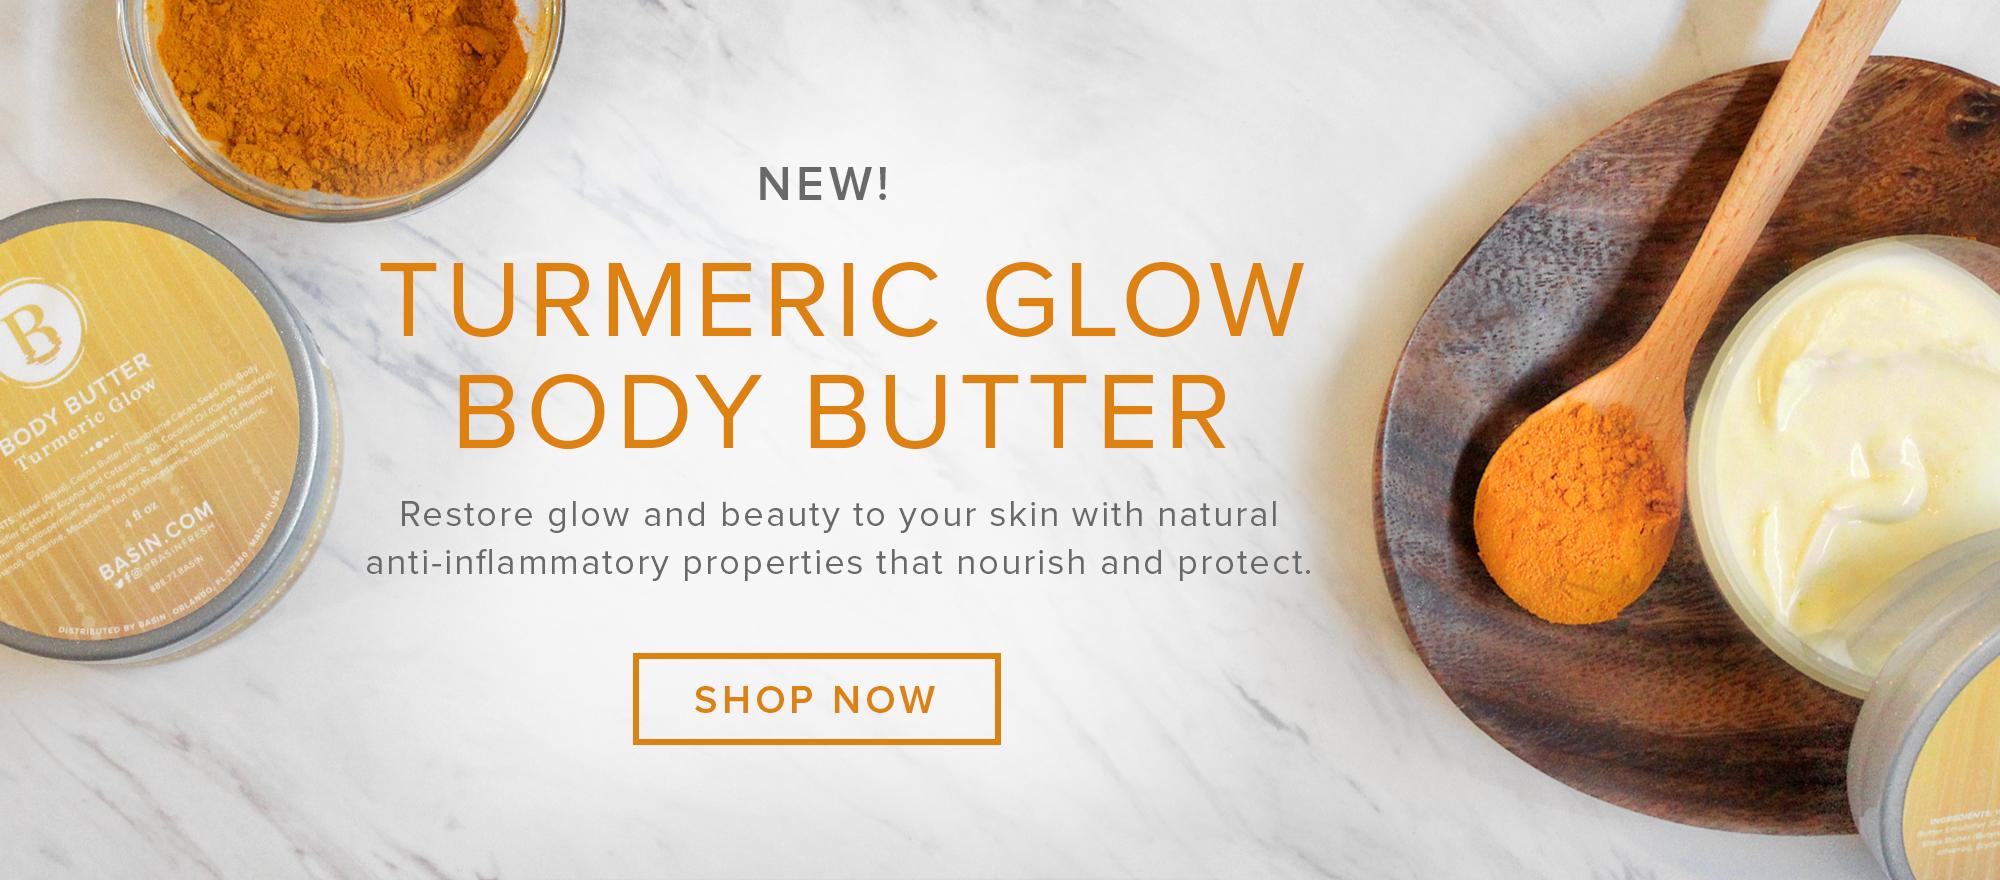 NEW Turmeric Glow Body Butter